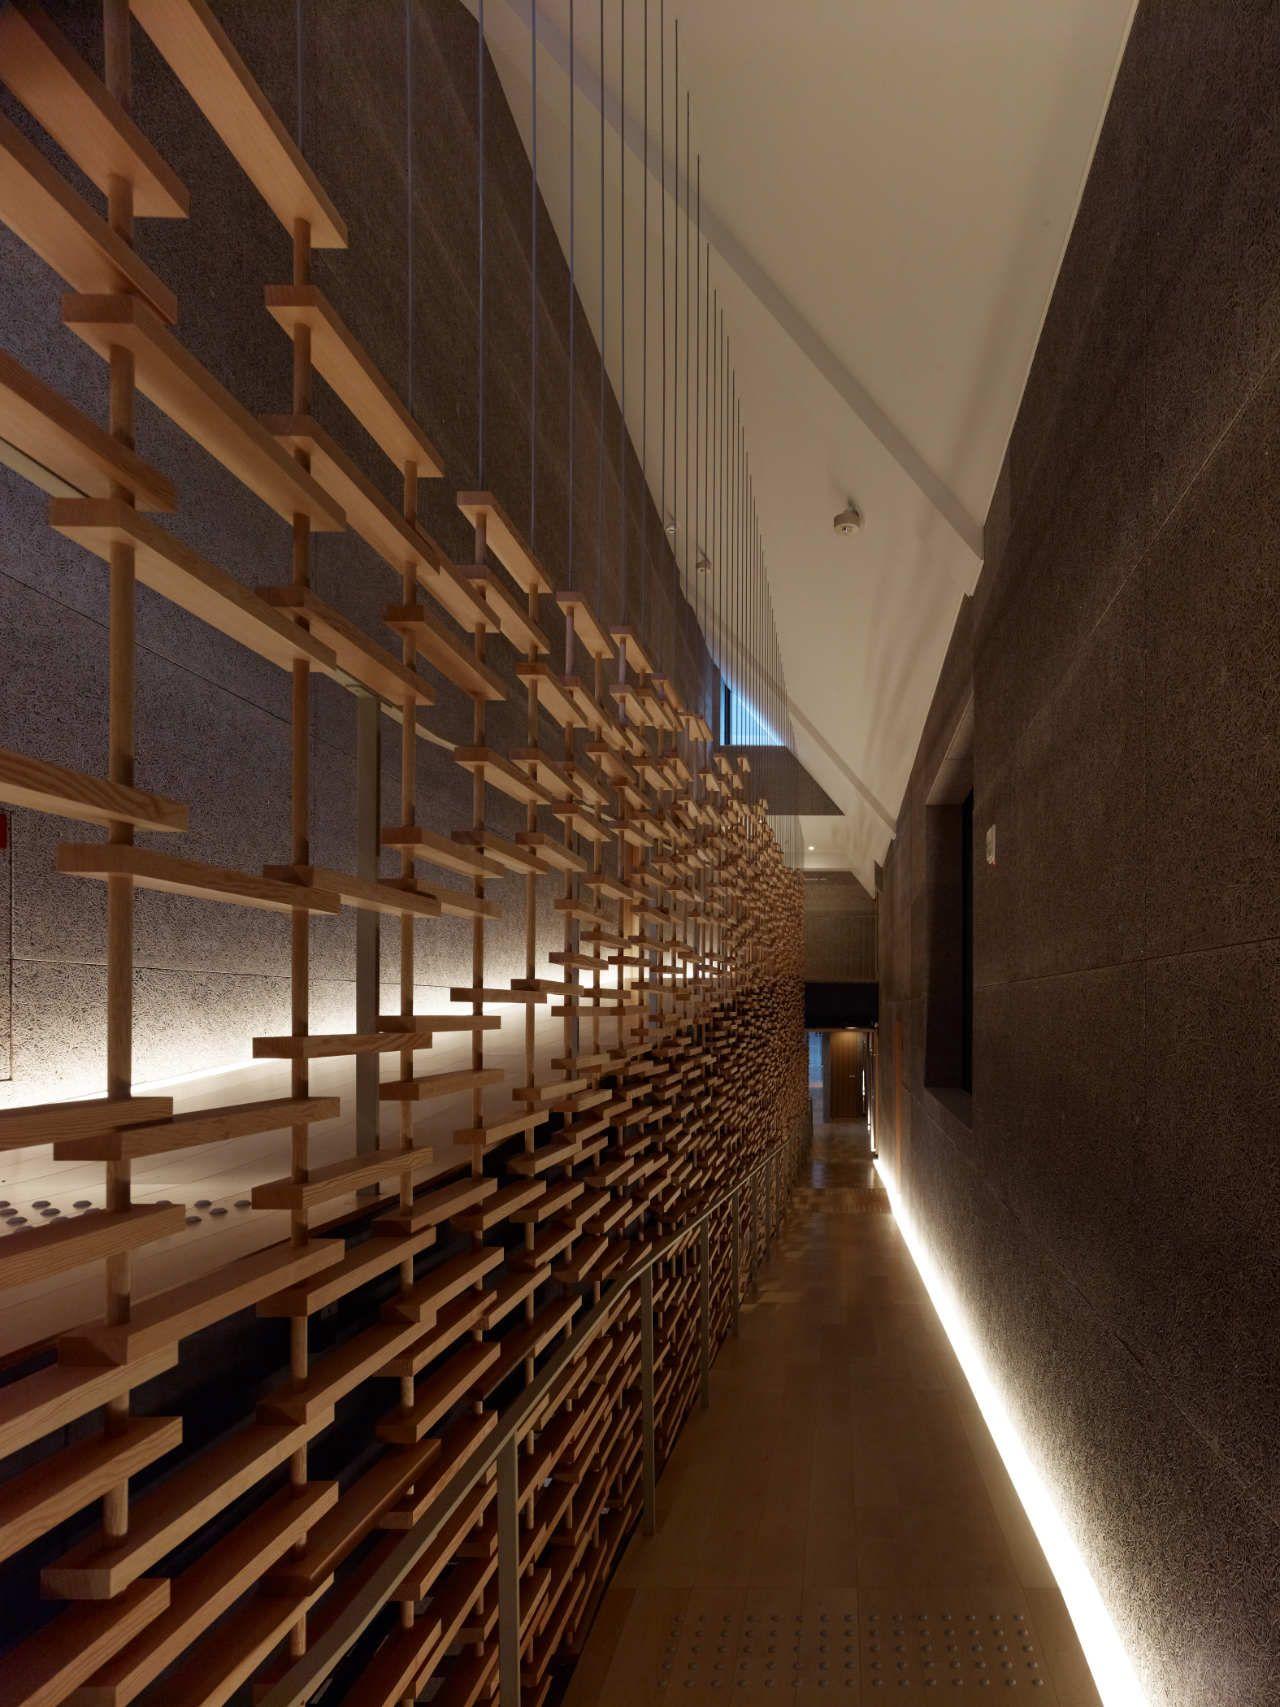 Momofuku Ando Center Kengo Kuma Associates 벽 디자인 건축